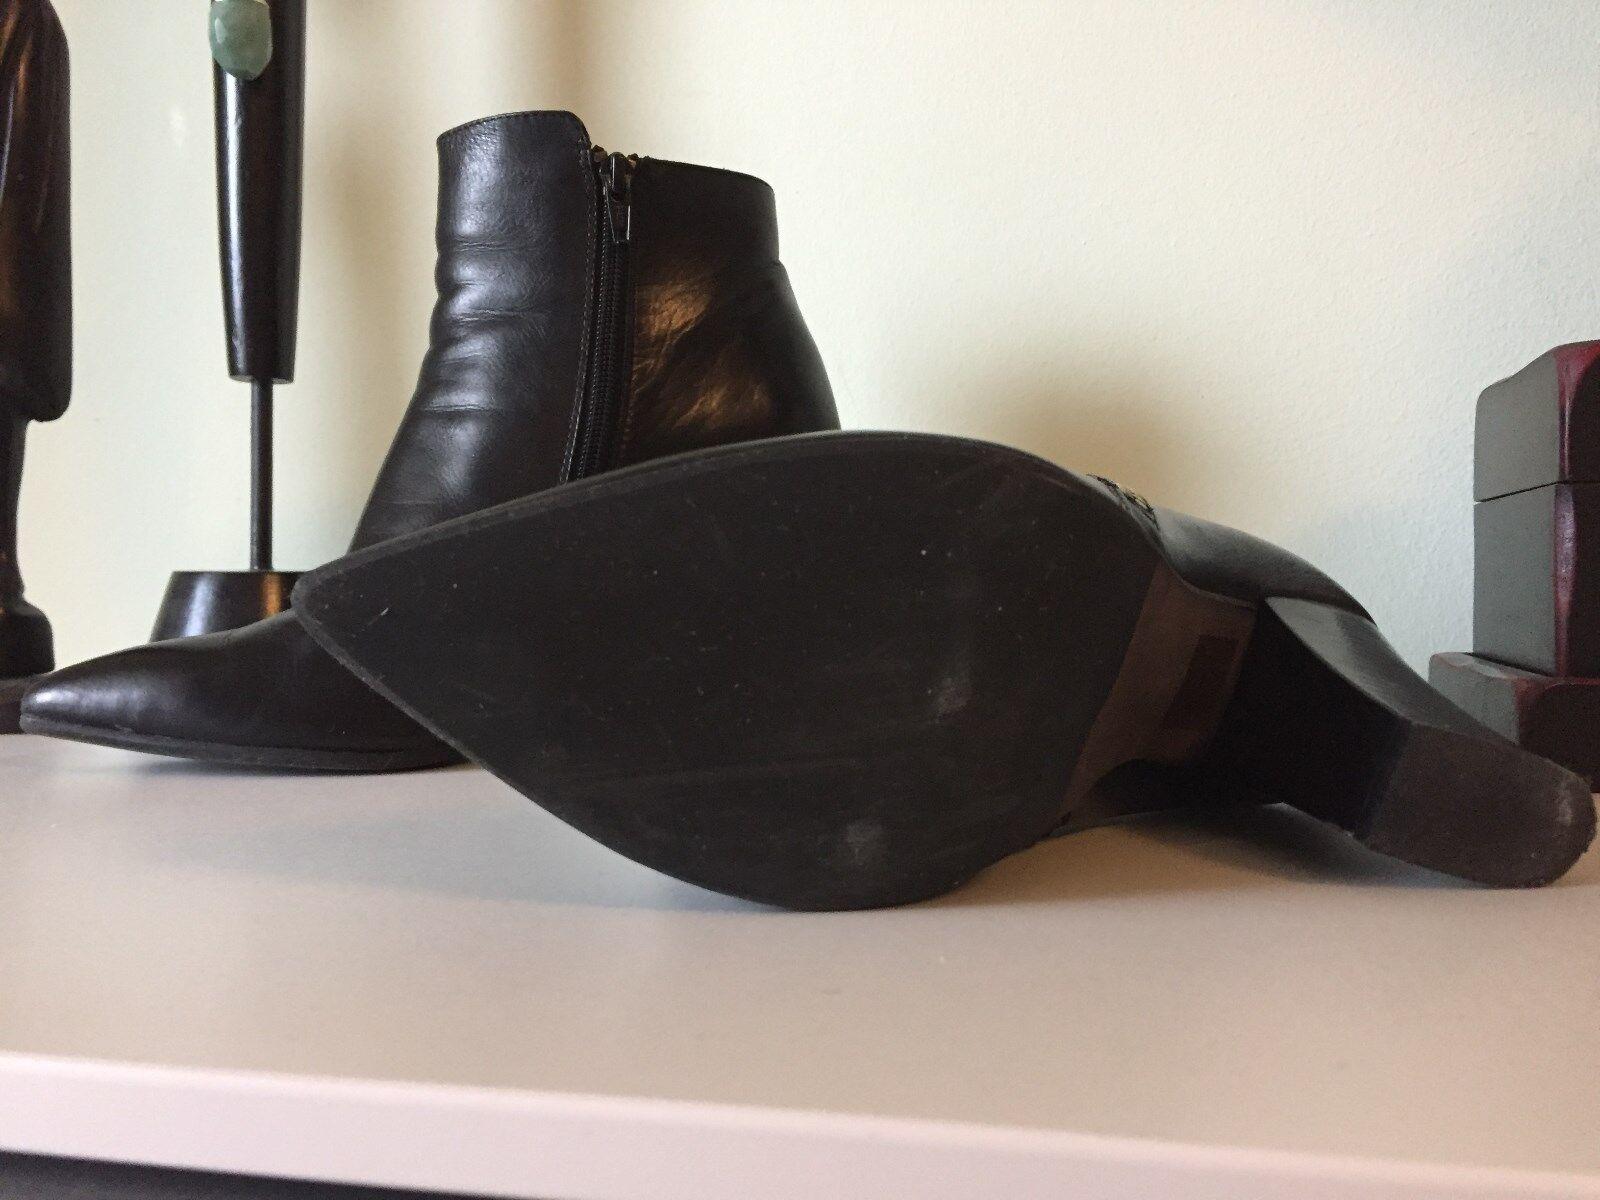 Schwarze Steffen Schraut Ankle Boots Echtleder Gr.: 40 NP: 360 Euro